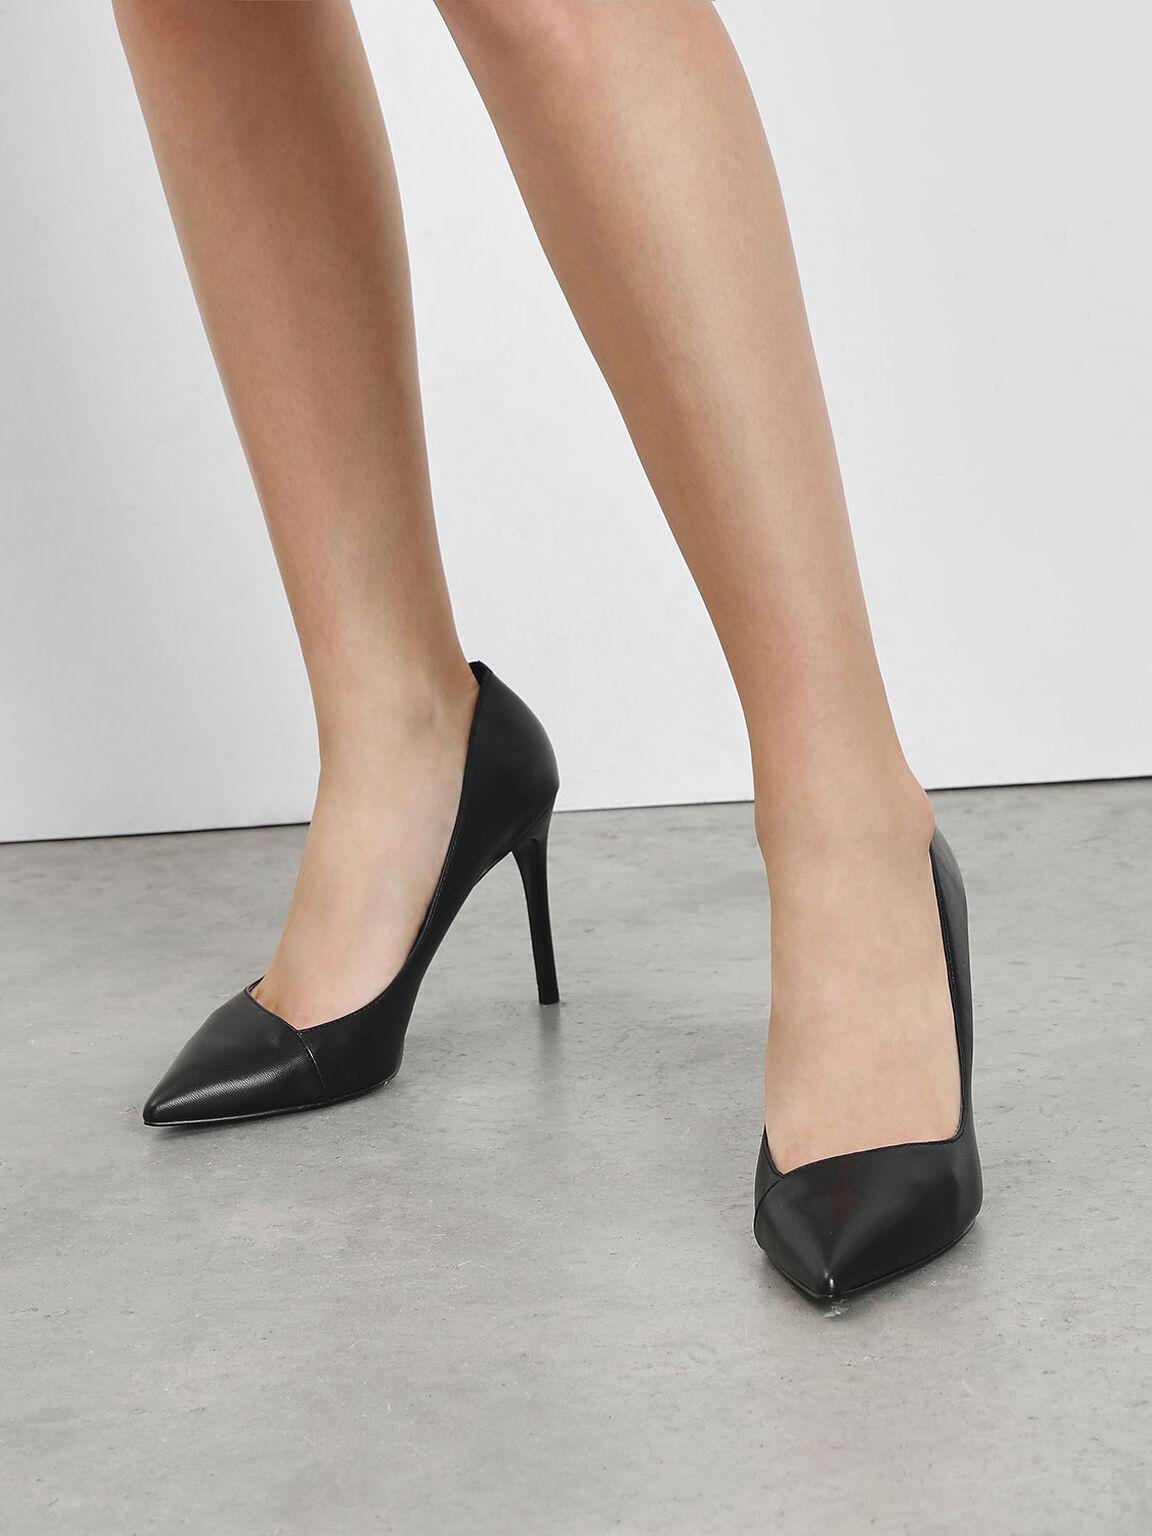 Asymmetrical Cut Stiletto Pumps, Black, hi-res